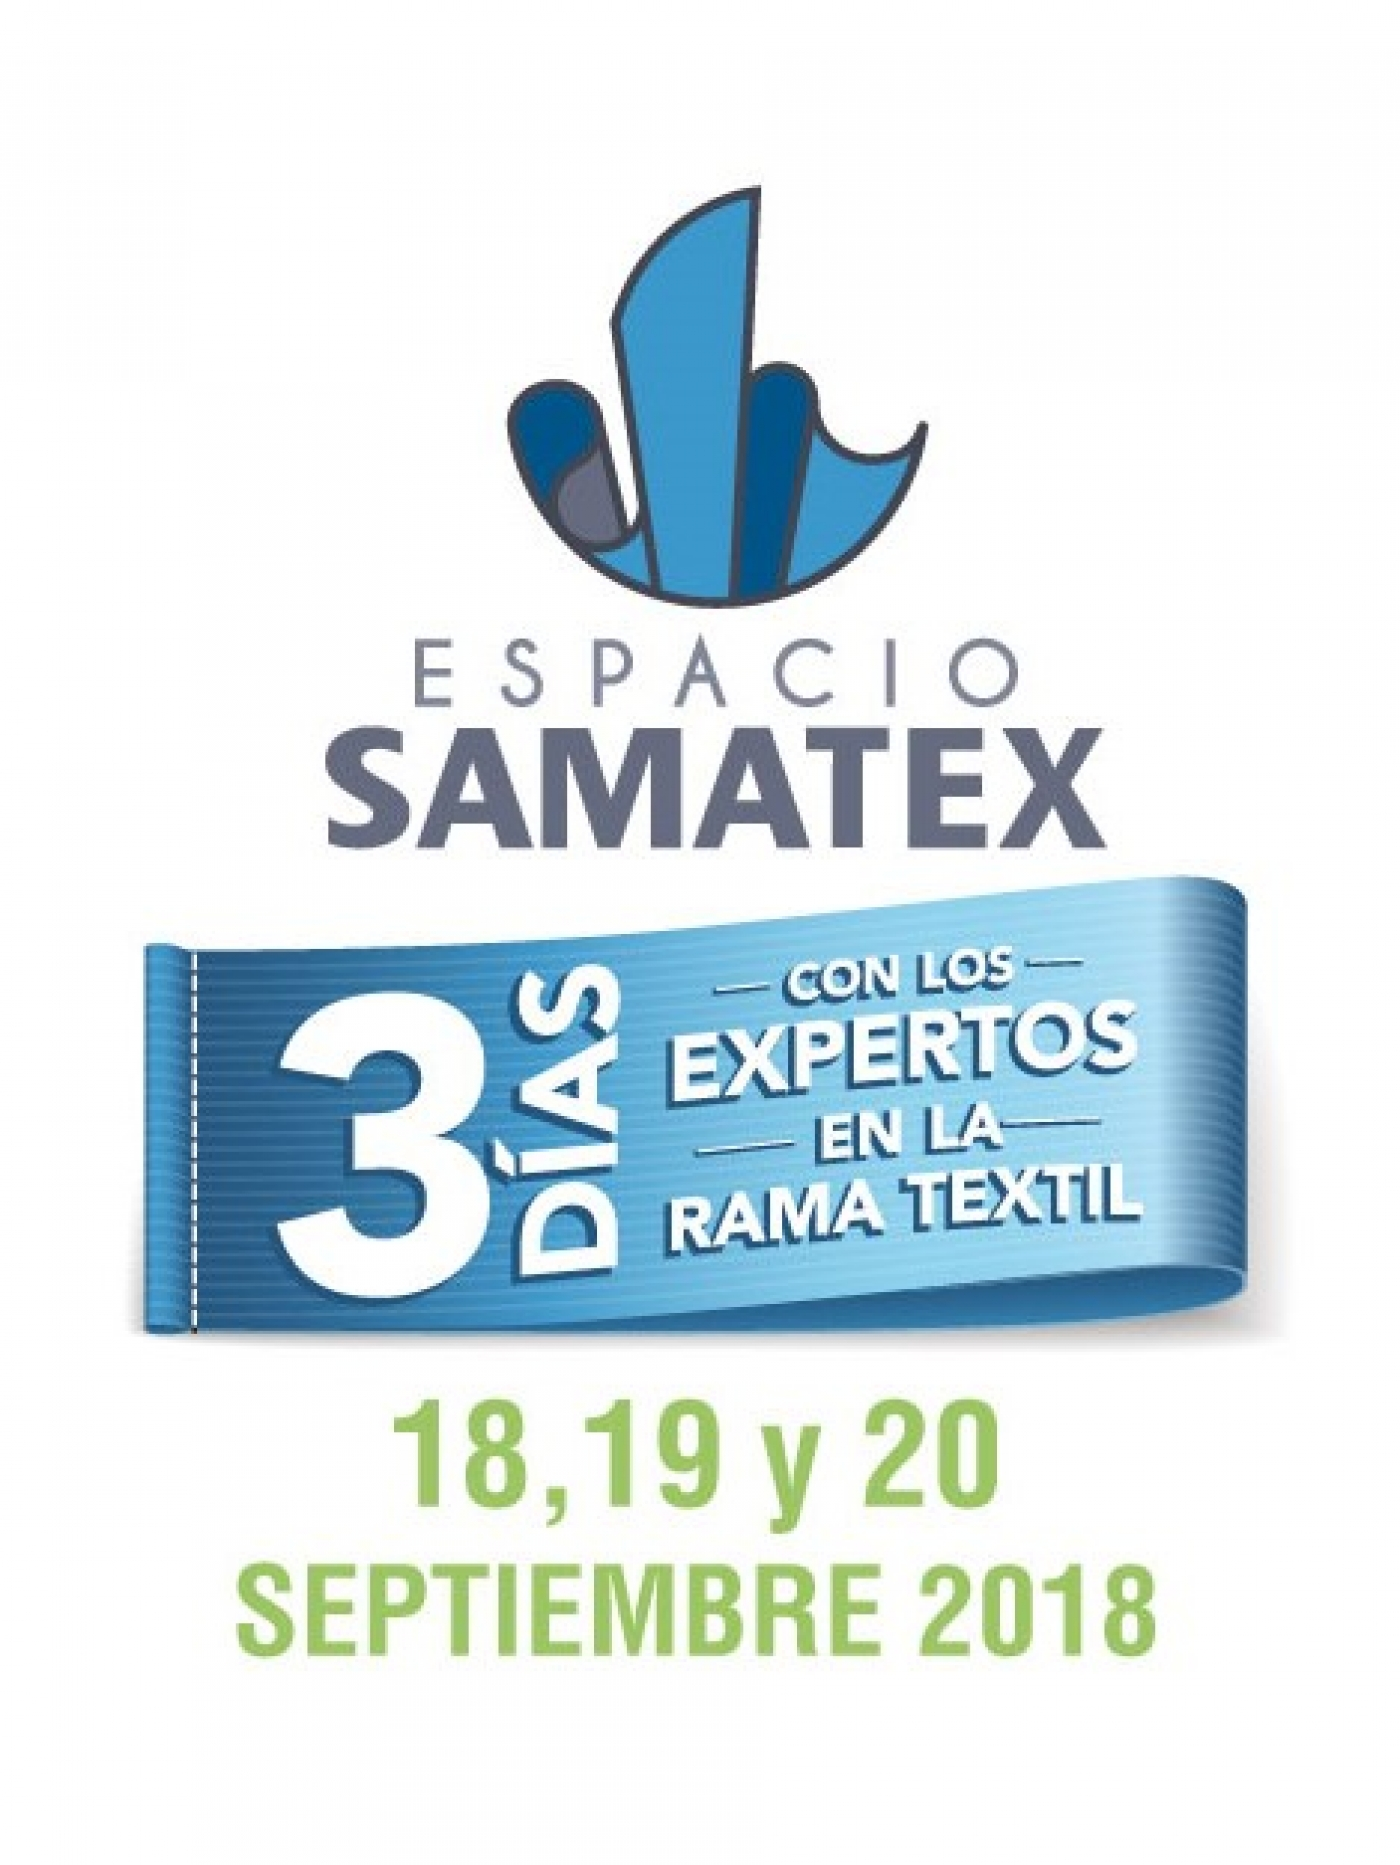 Espacio Samatex